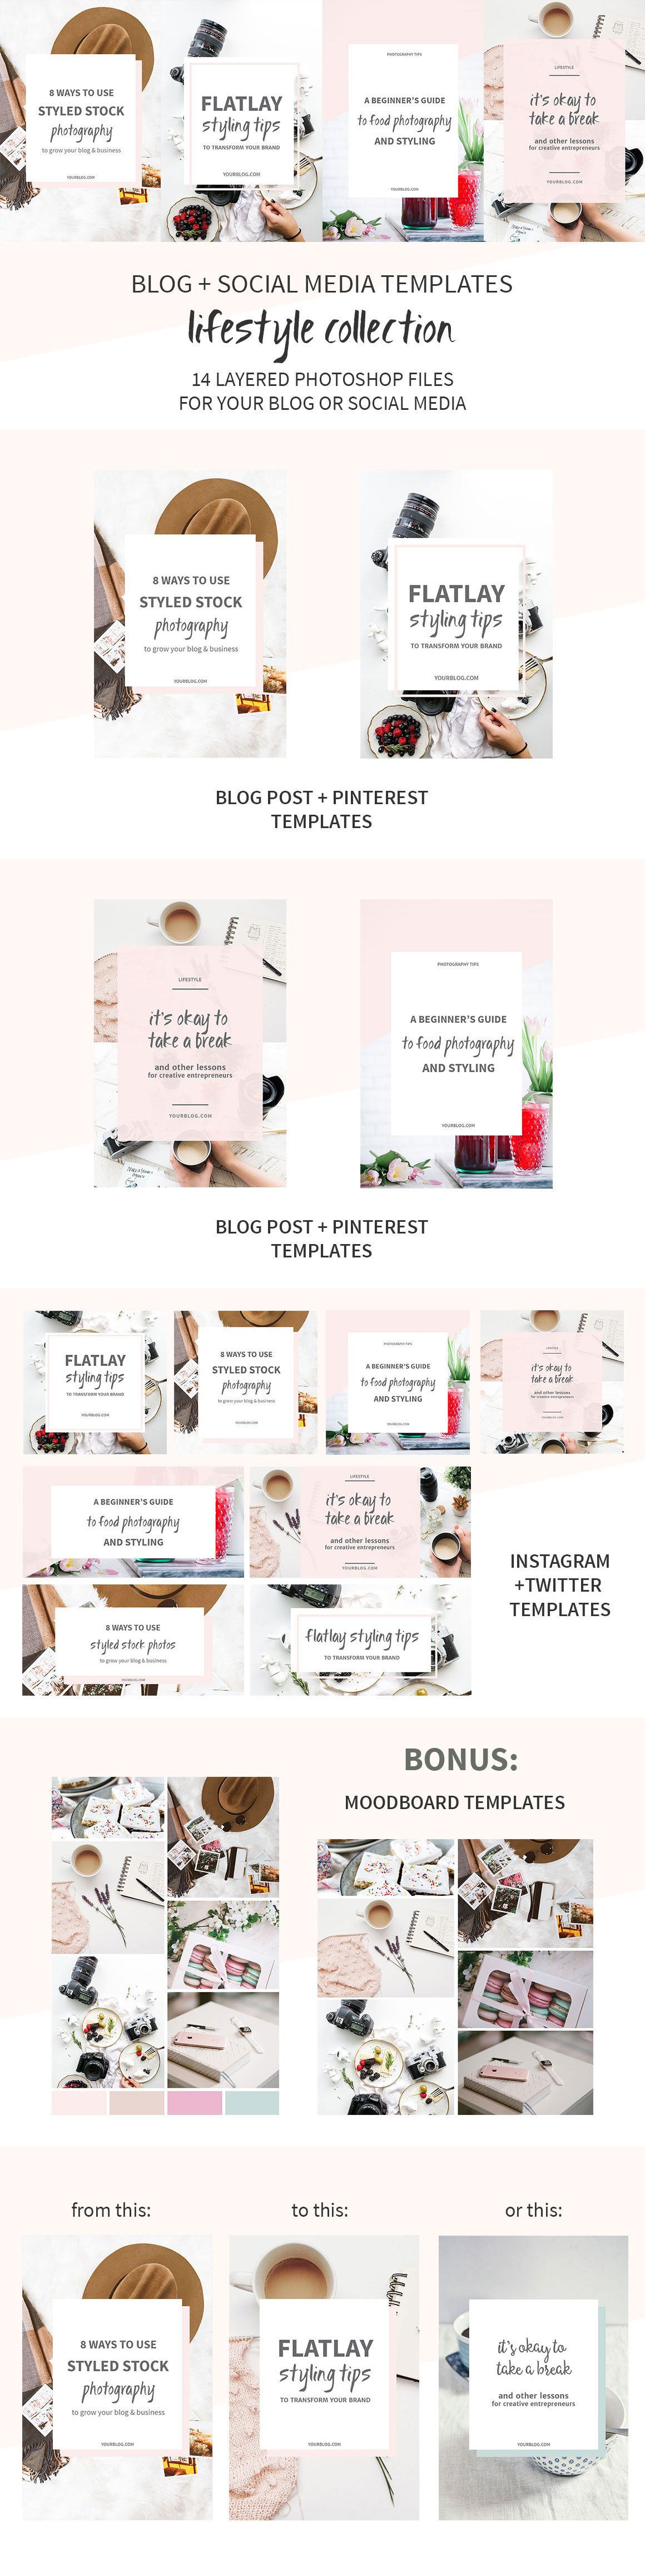 Blog + Social Media Image Templates